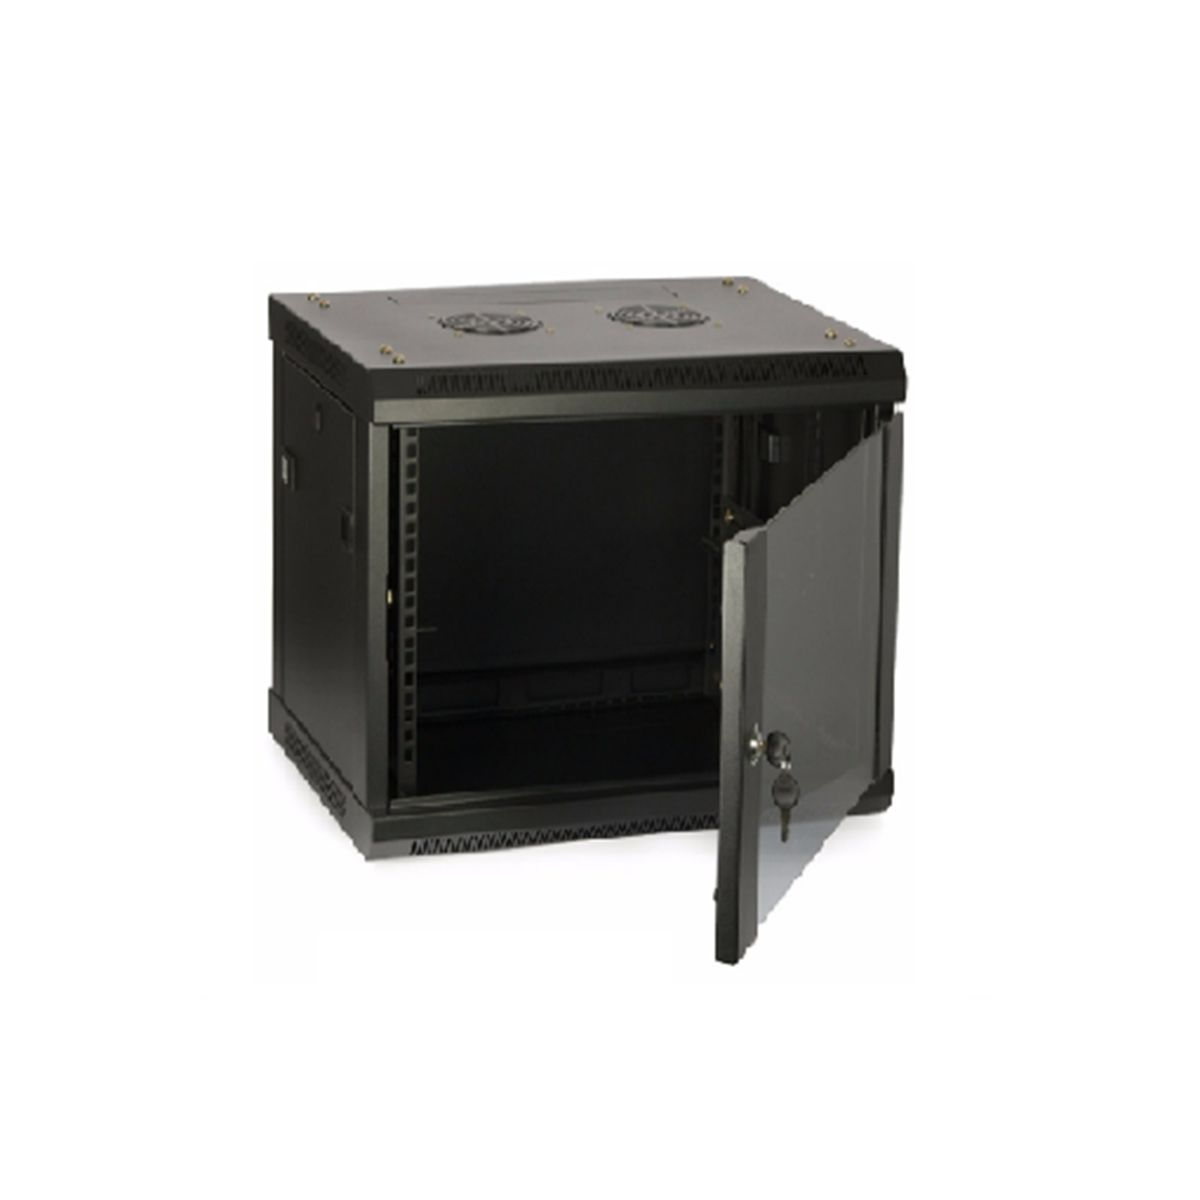 Rack gabinete de pared cerrado Wireplus de 9 U puerta de vidrio